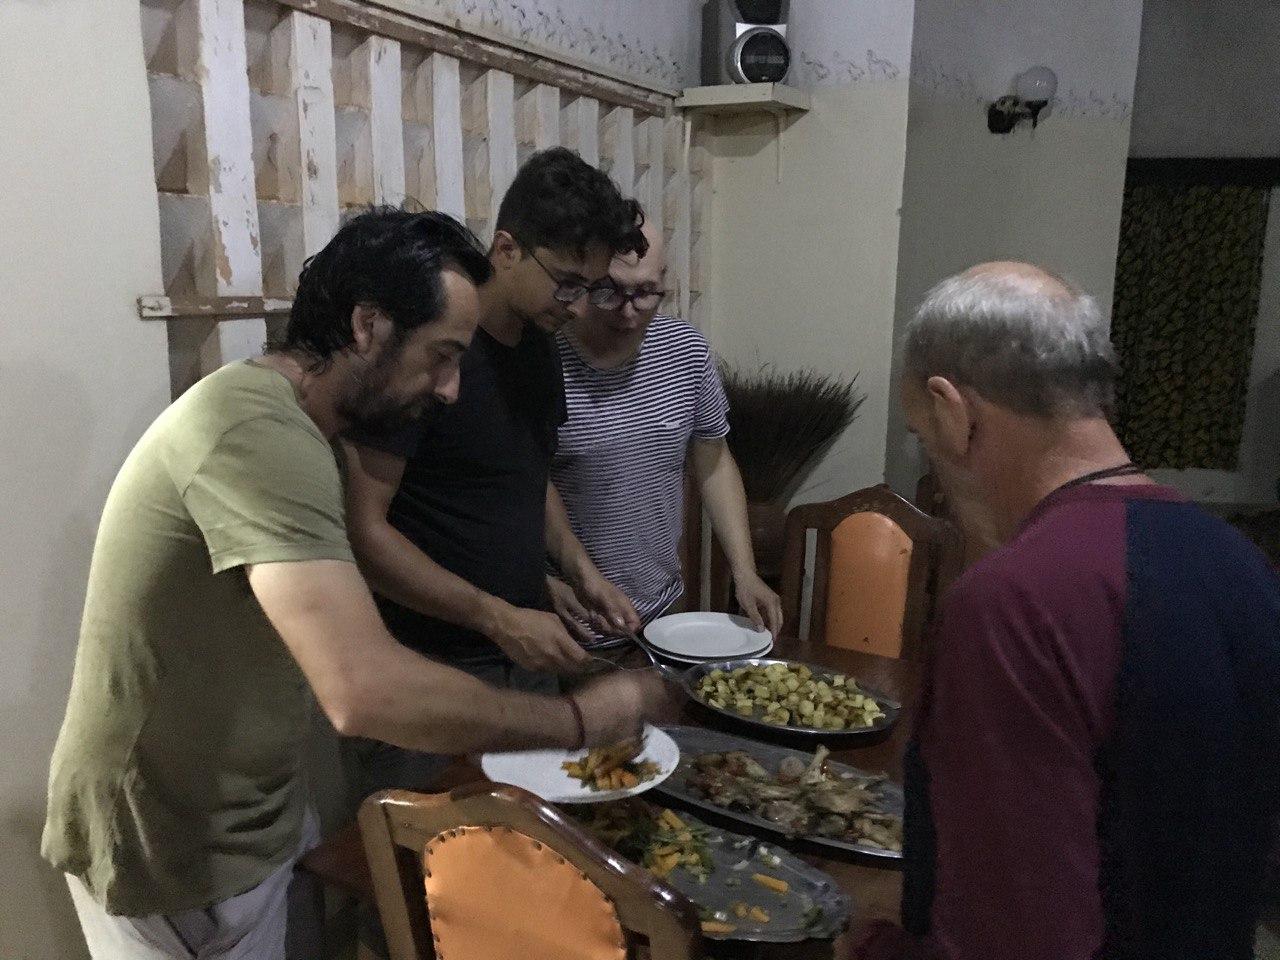 comiendo pollo bicicleta en un restaurante en benin